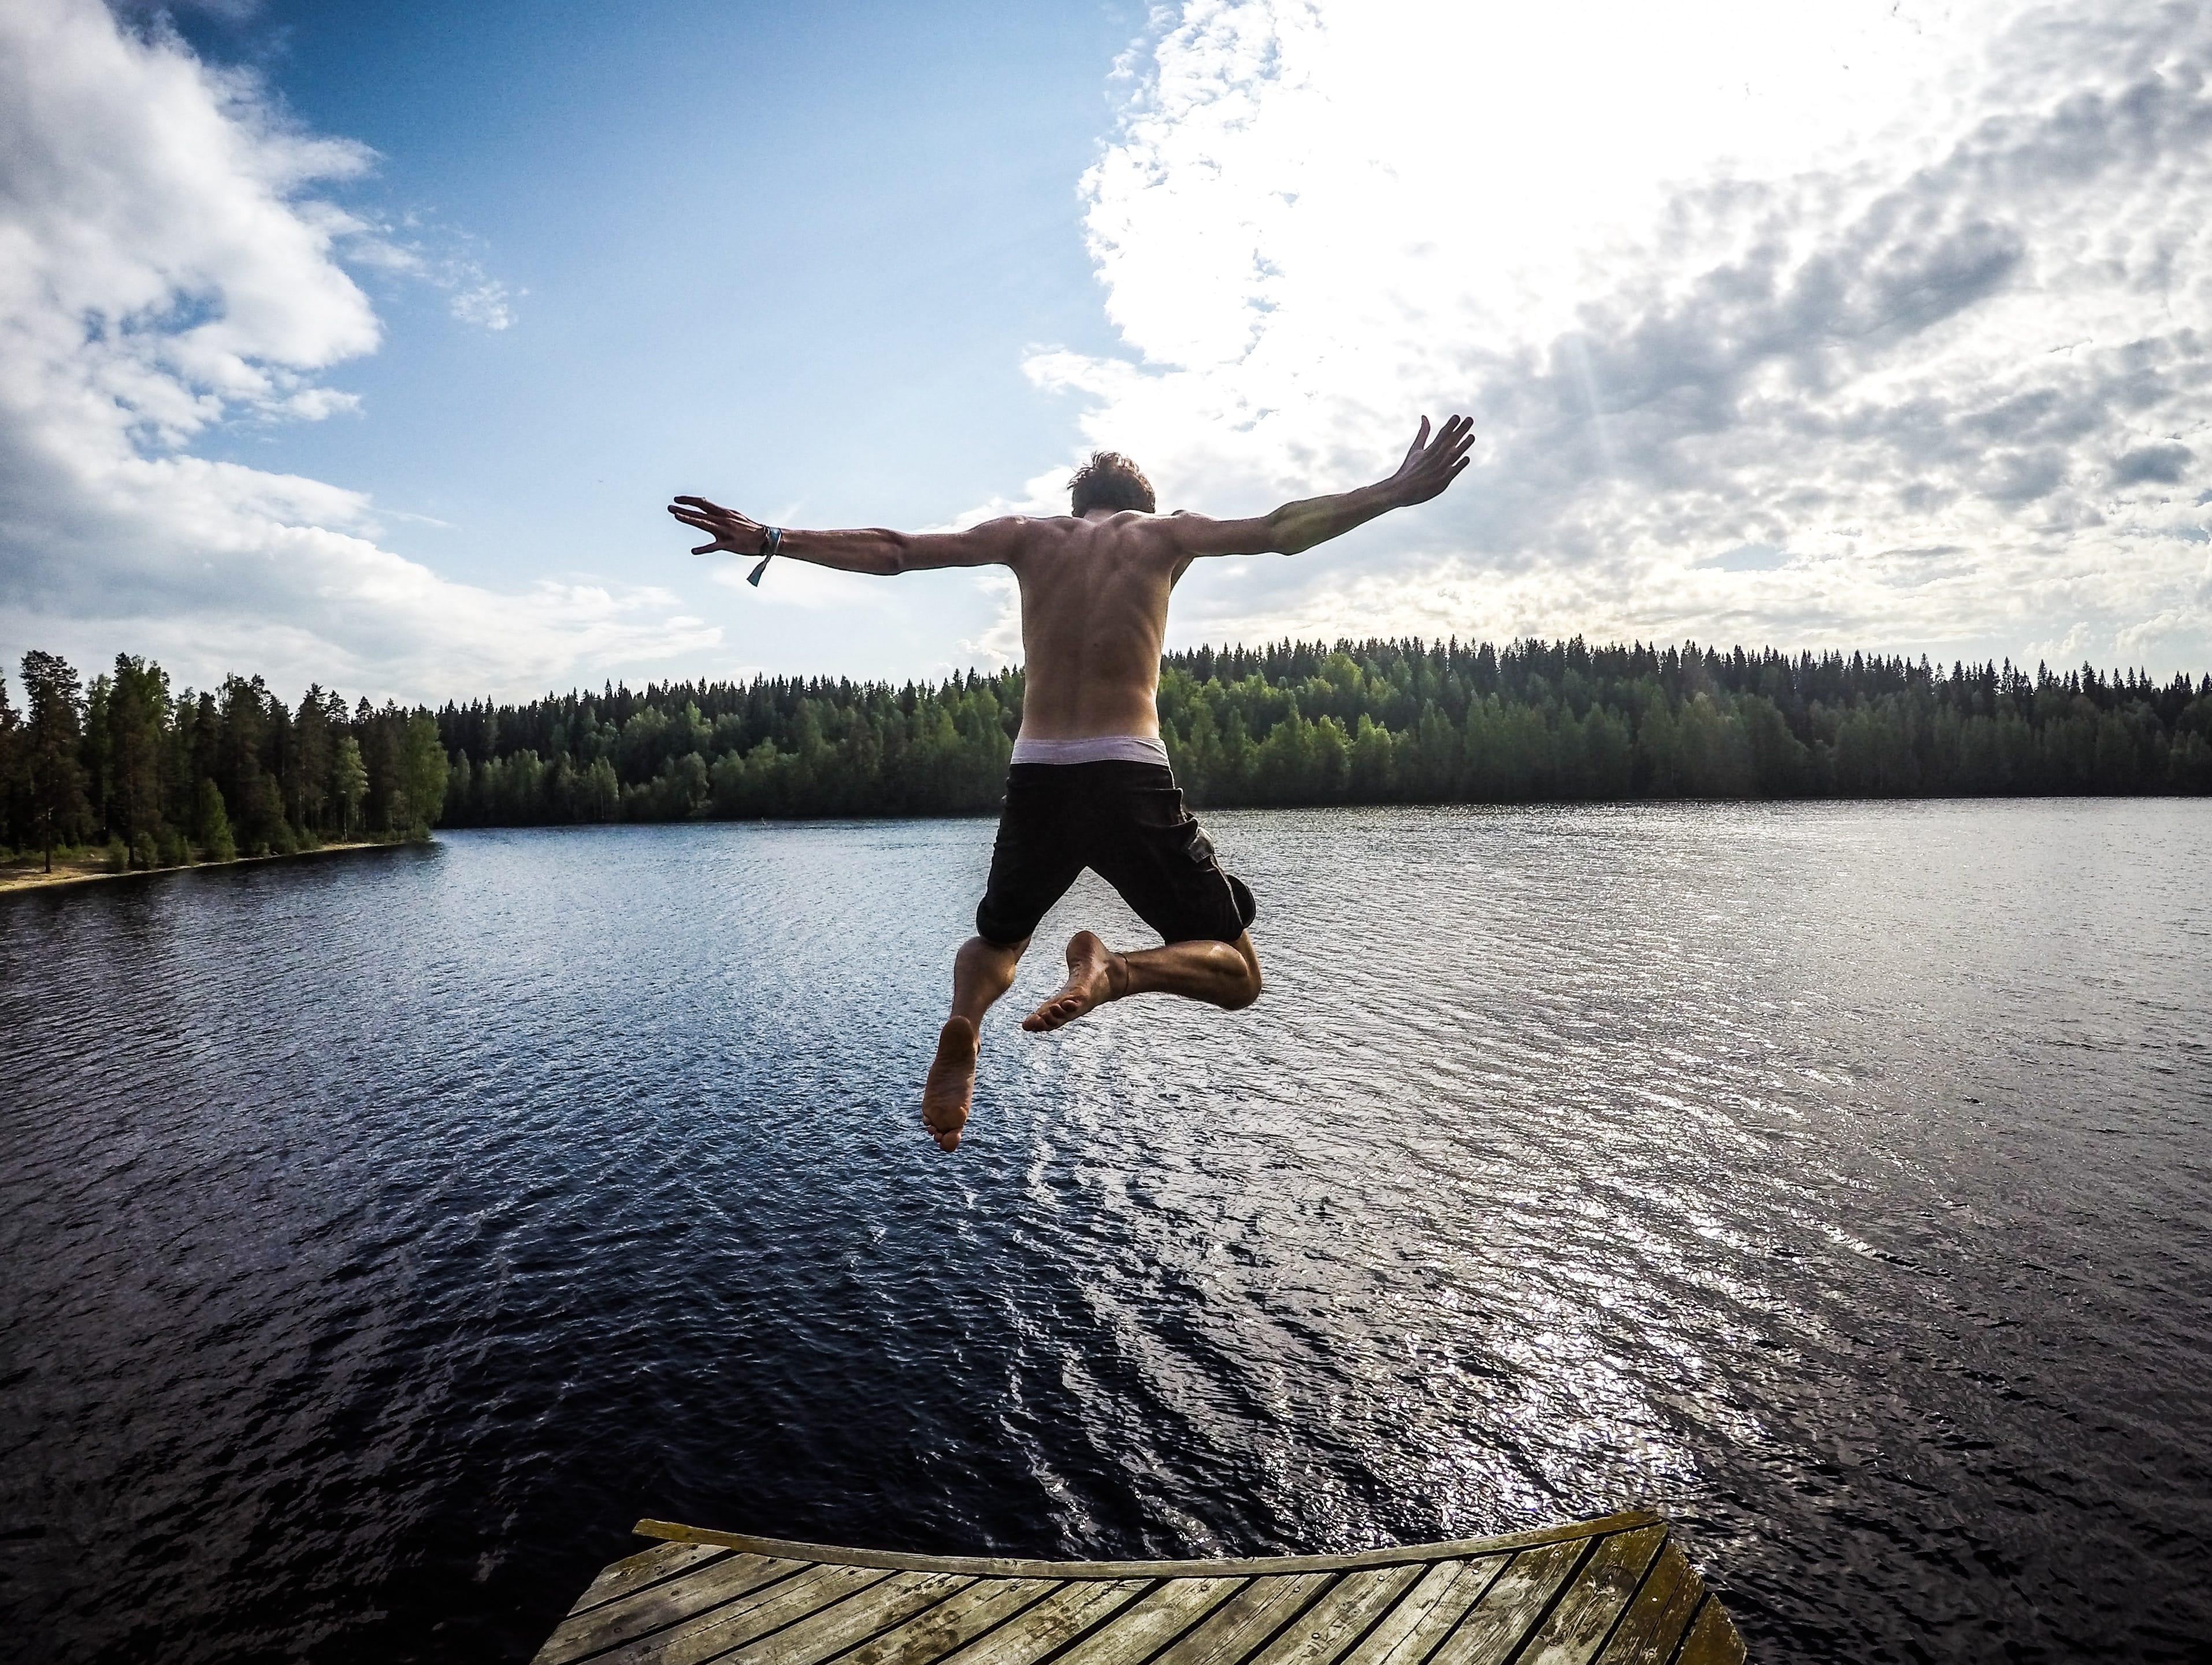 voyage-finlande-centenaire-independance-tommaso-fornoni